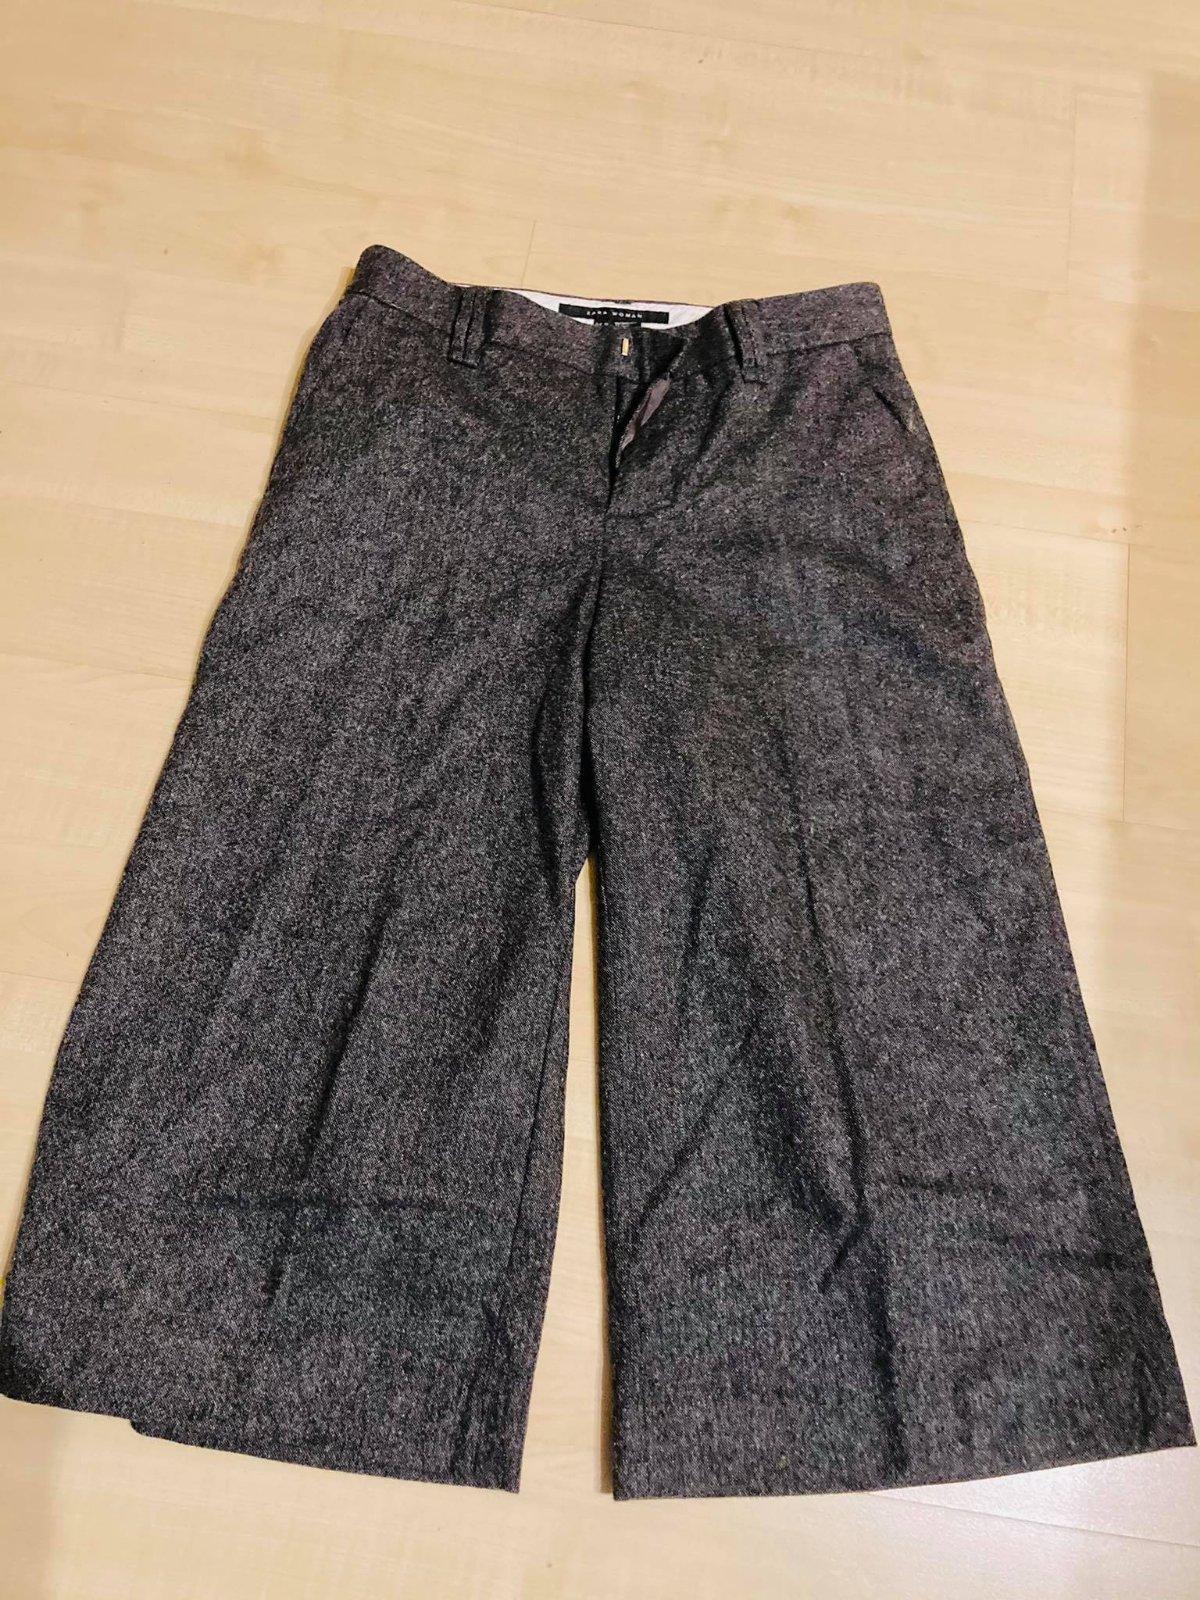 Zara 3/4 nohavice - Obrázok č. 1